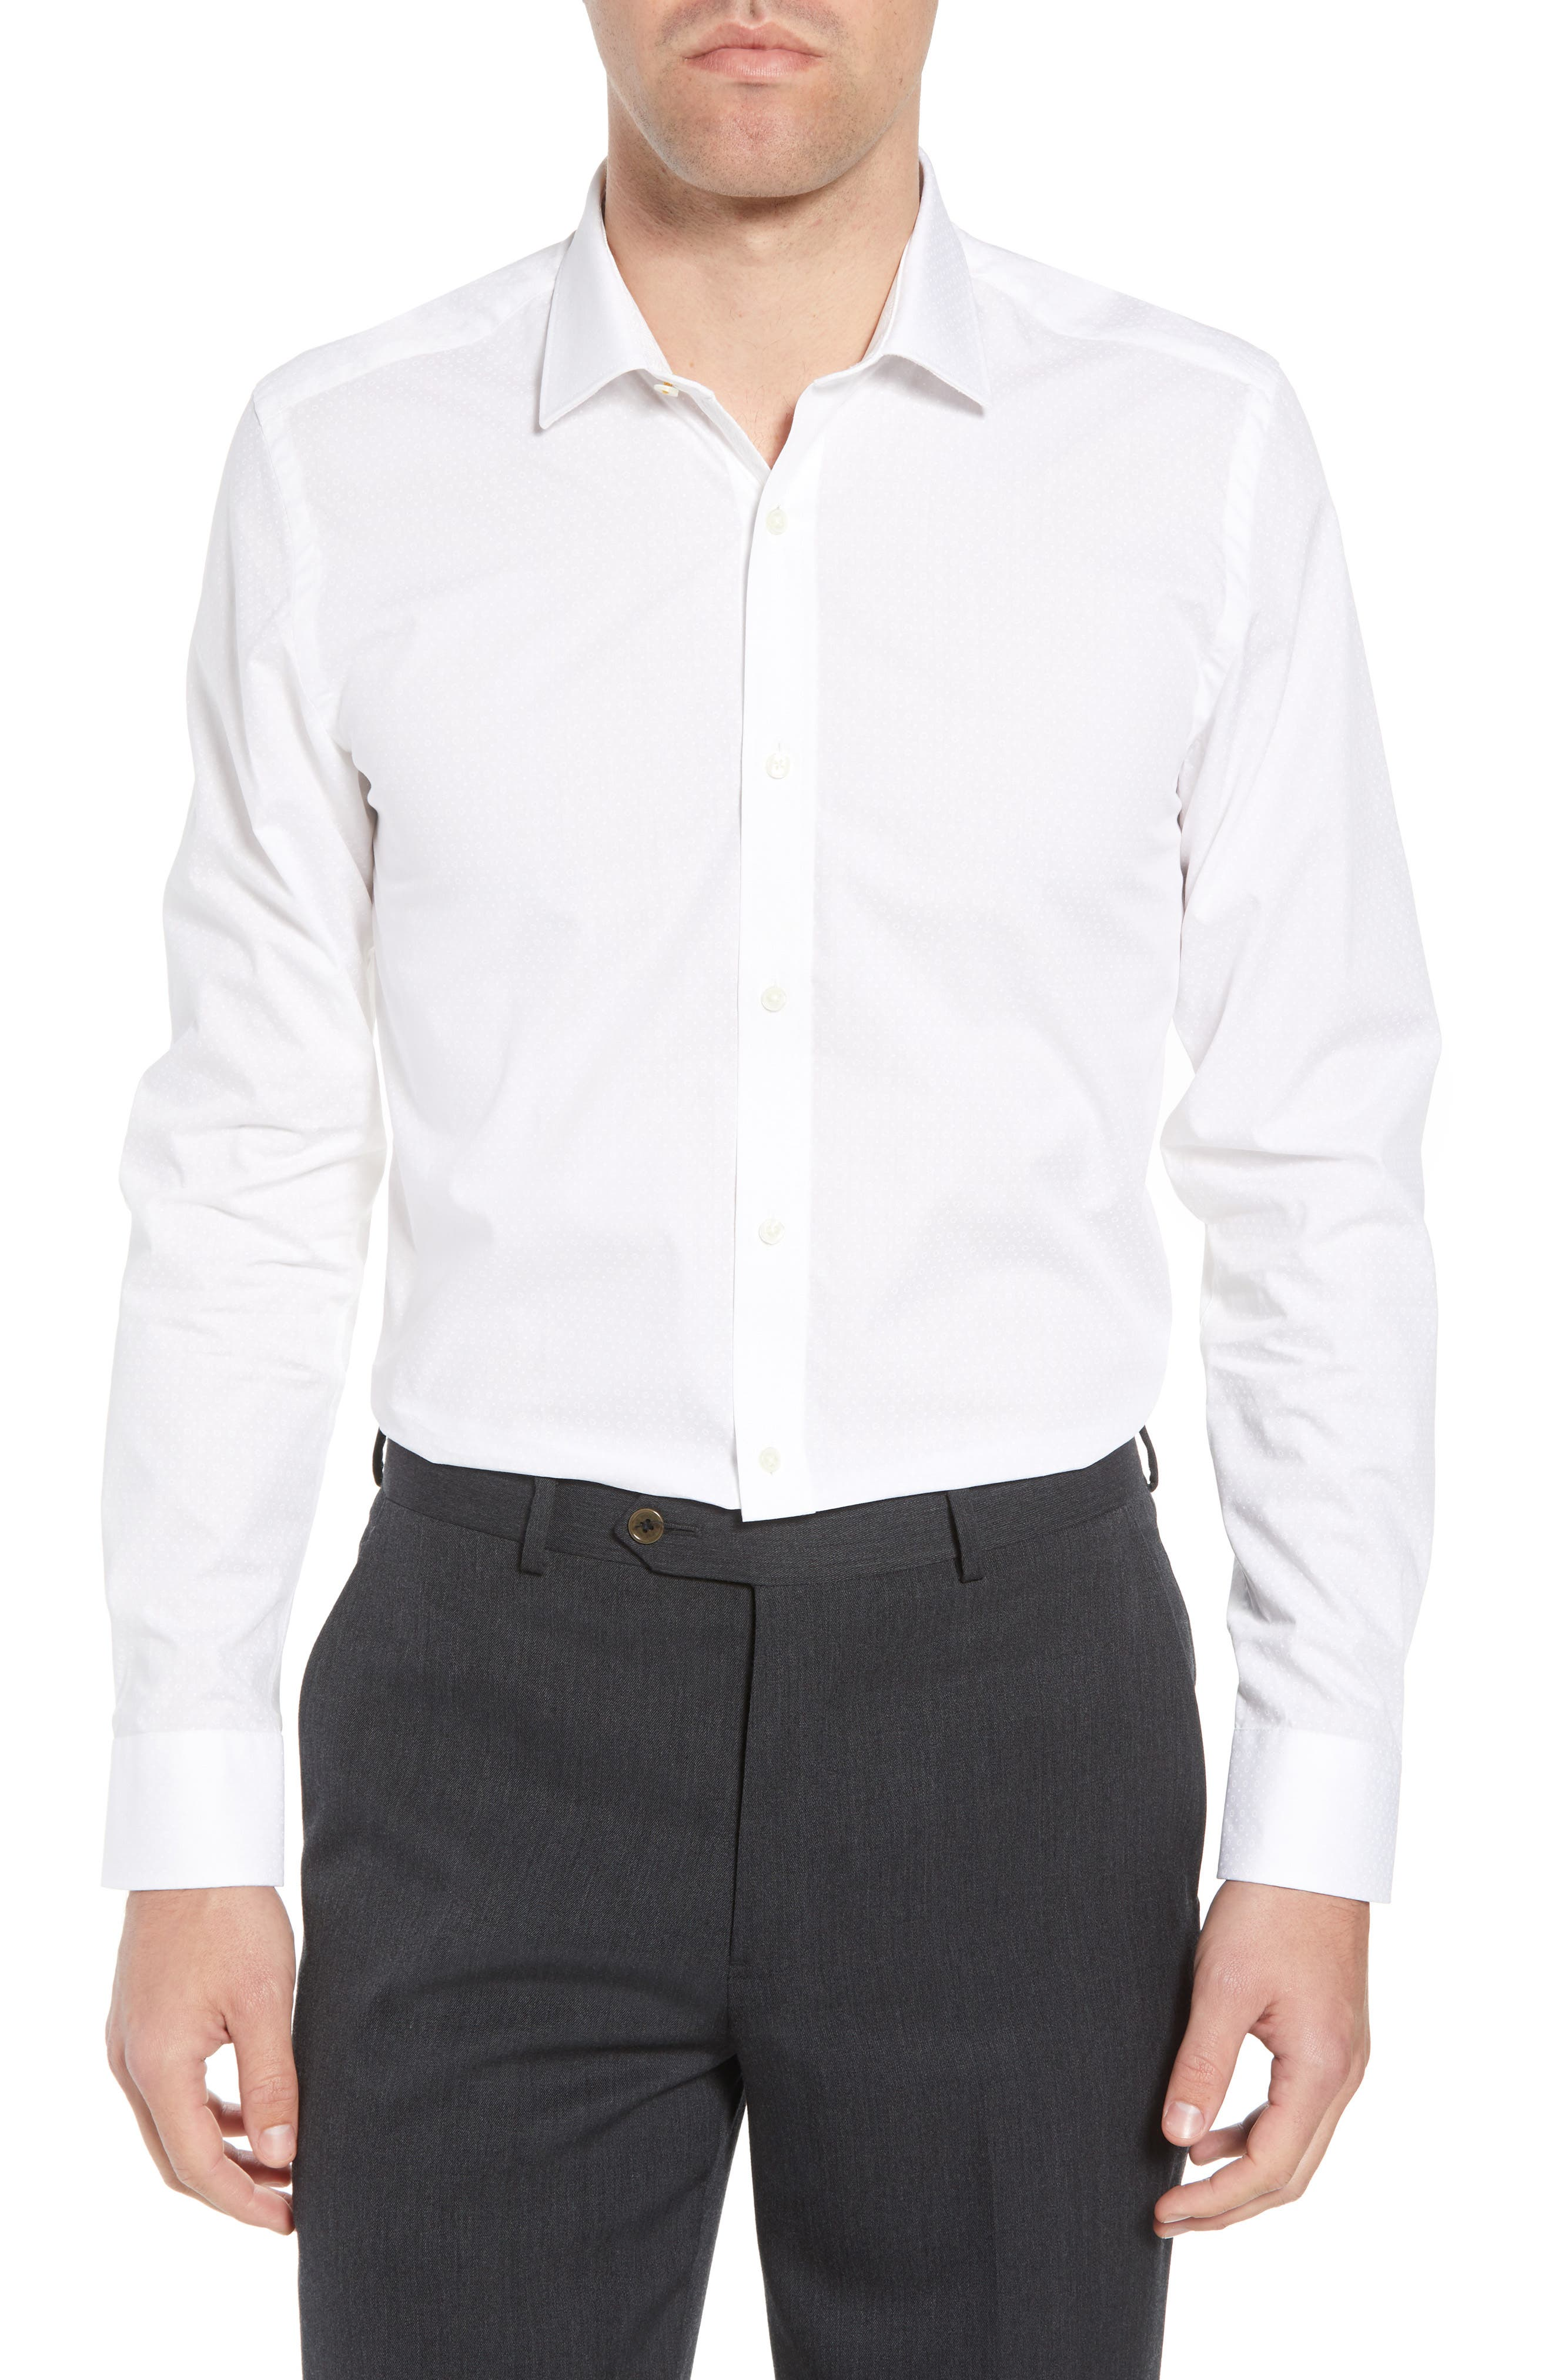 Loops Slim Fit Dress Shirt,                             Main thumbnail 1, color,                             110